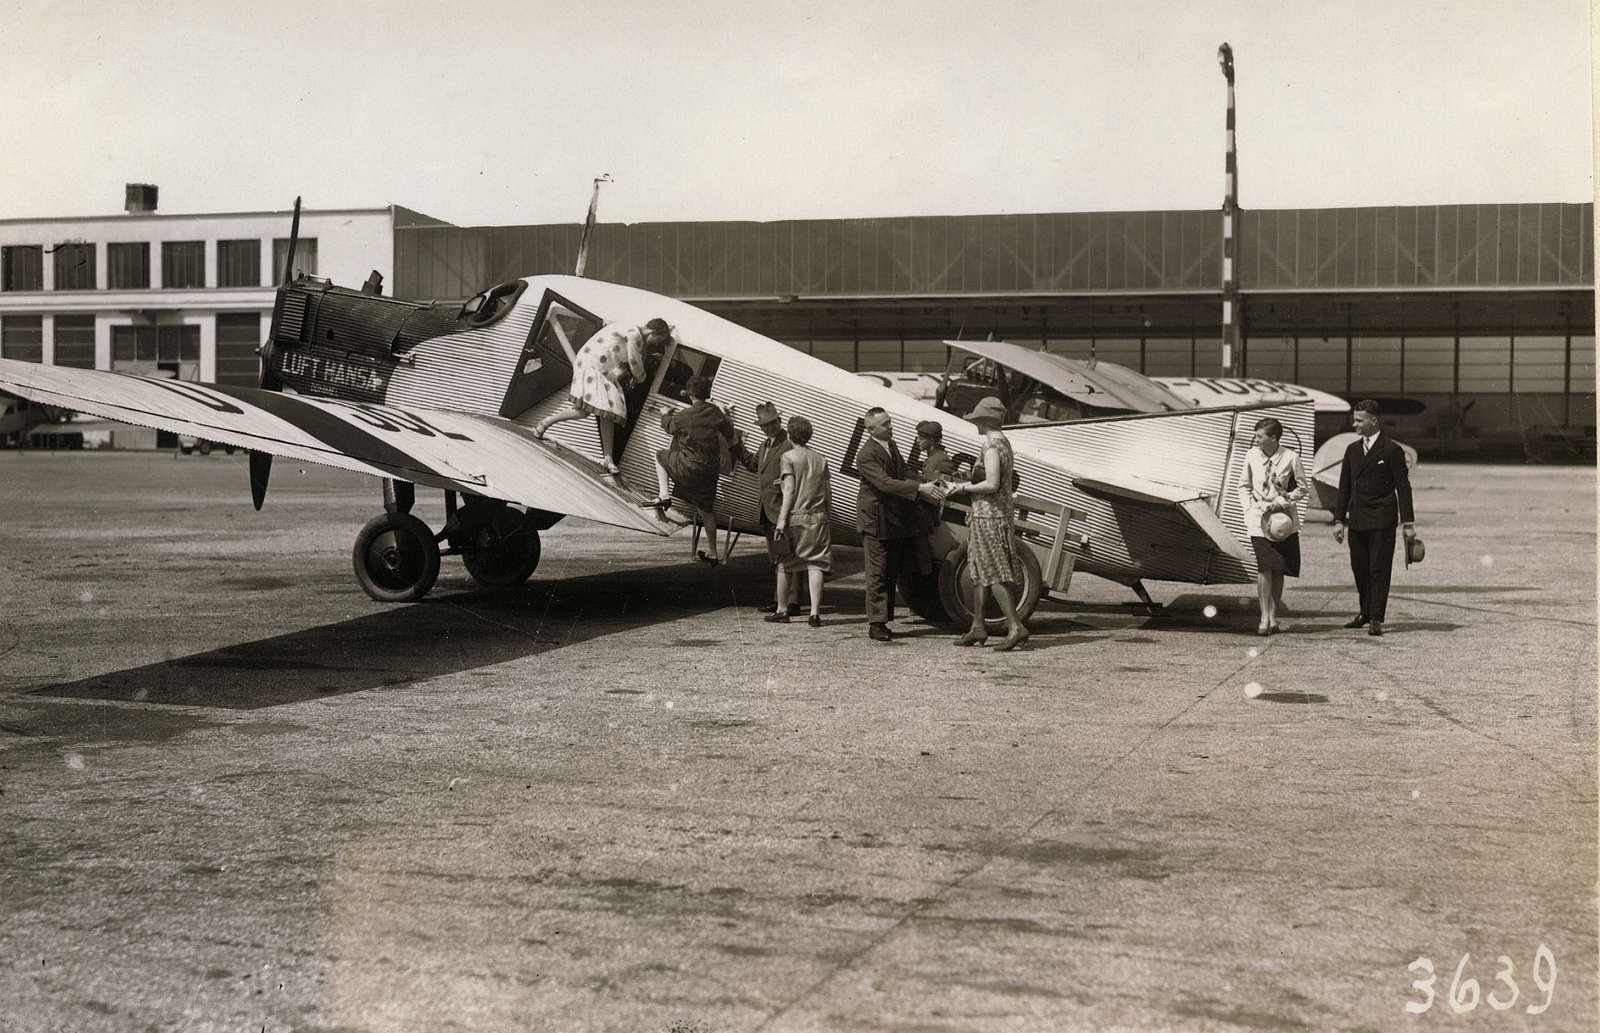 Tyskt trafikflyg, Junkersplan.